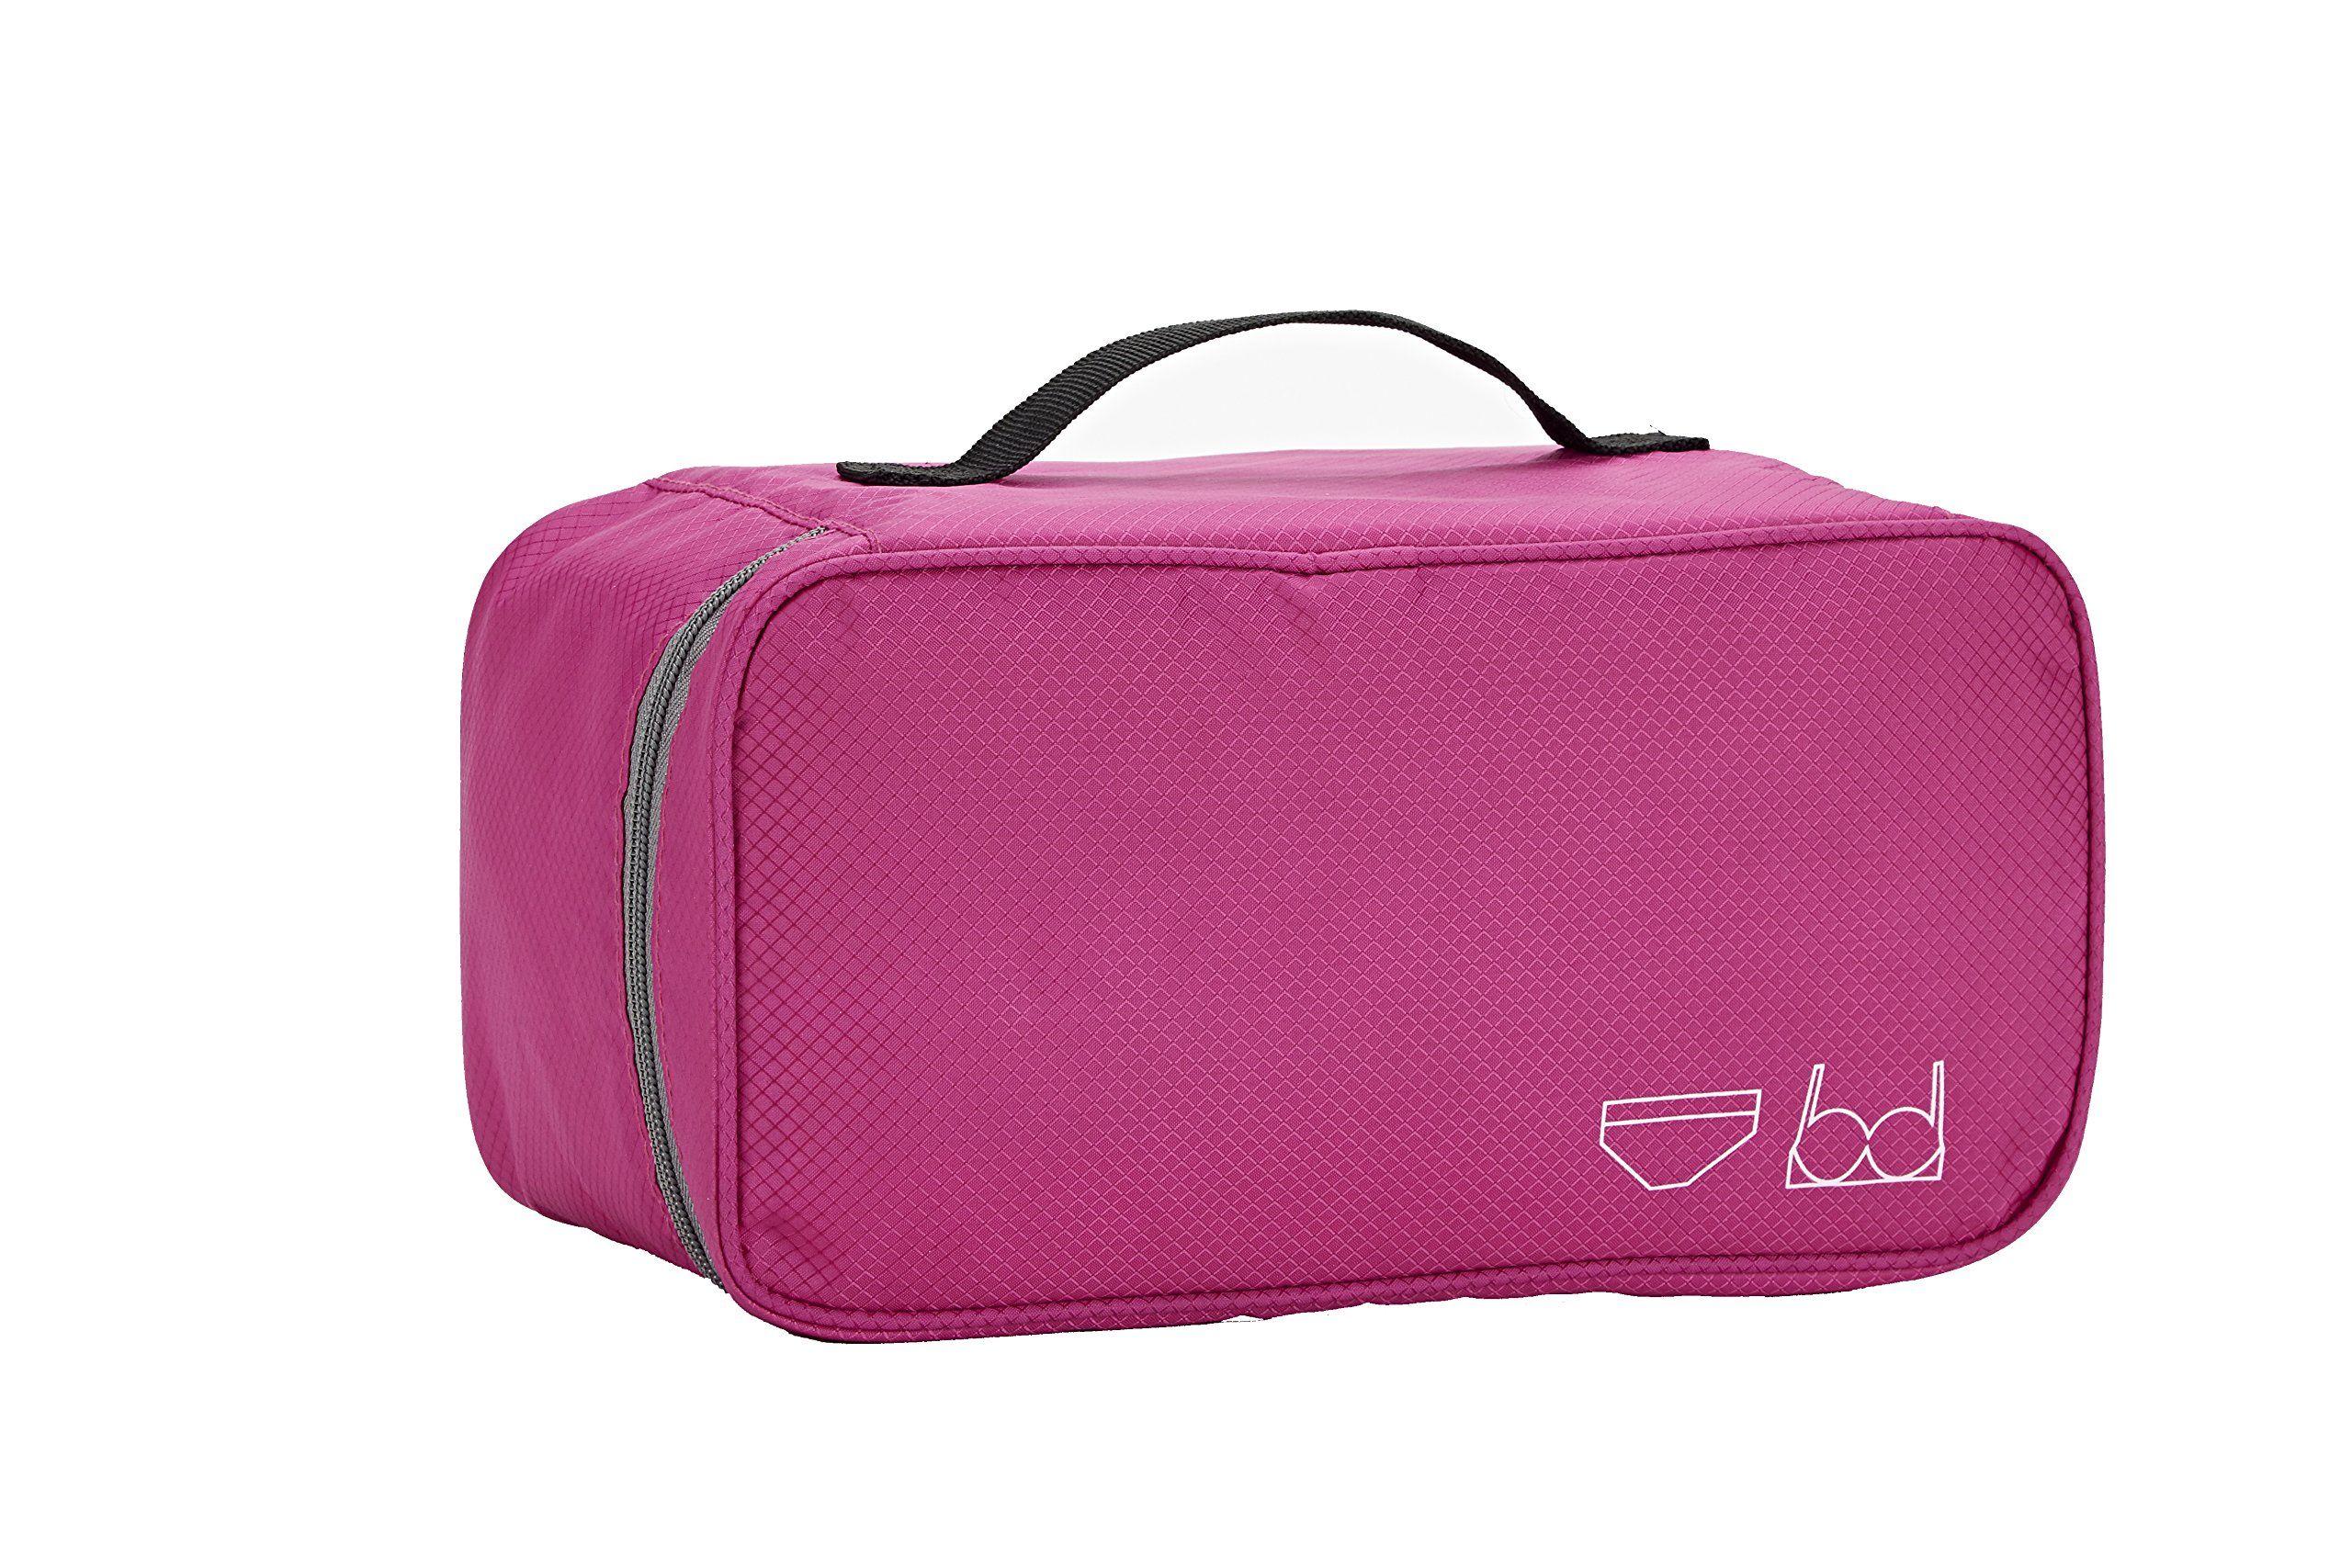 96a9e6bbce96 Packing Organizer Bra Underwear Storage Bag Travel Lingerie Pouch Toiletry  Organizer Handbag Cosmetic Makeup Bag Luggage Storage Case For Cosmetics